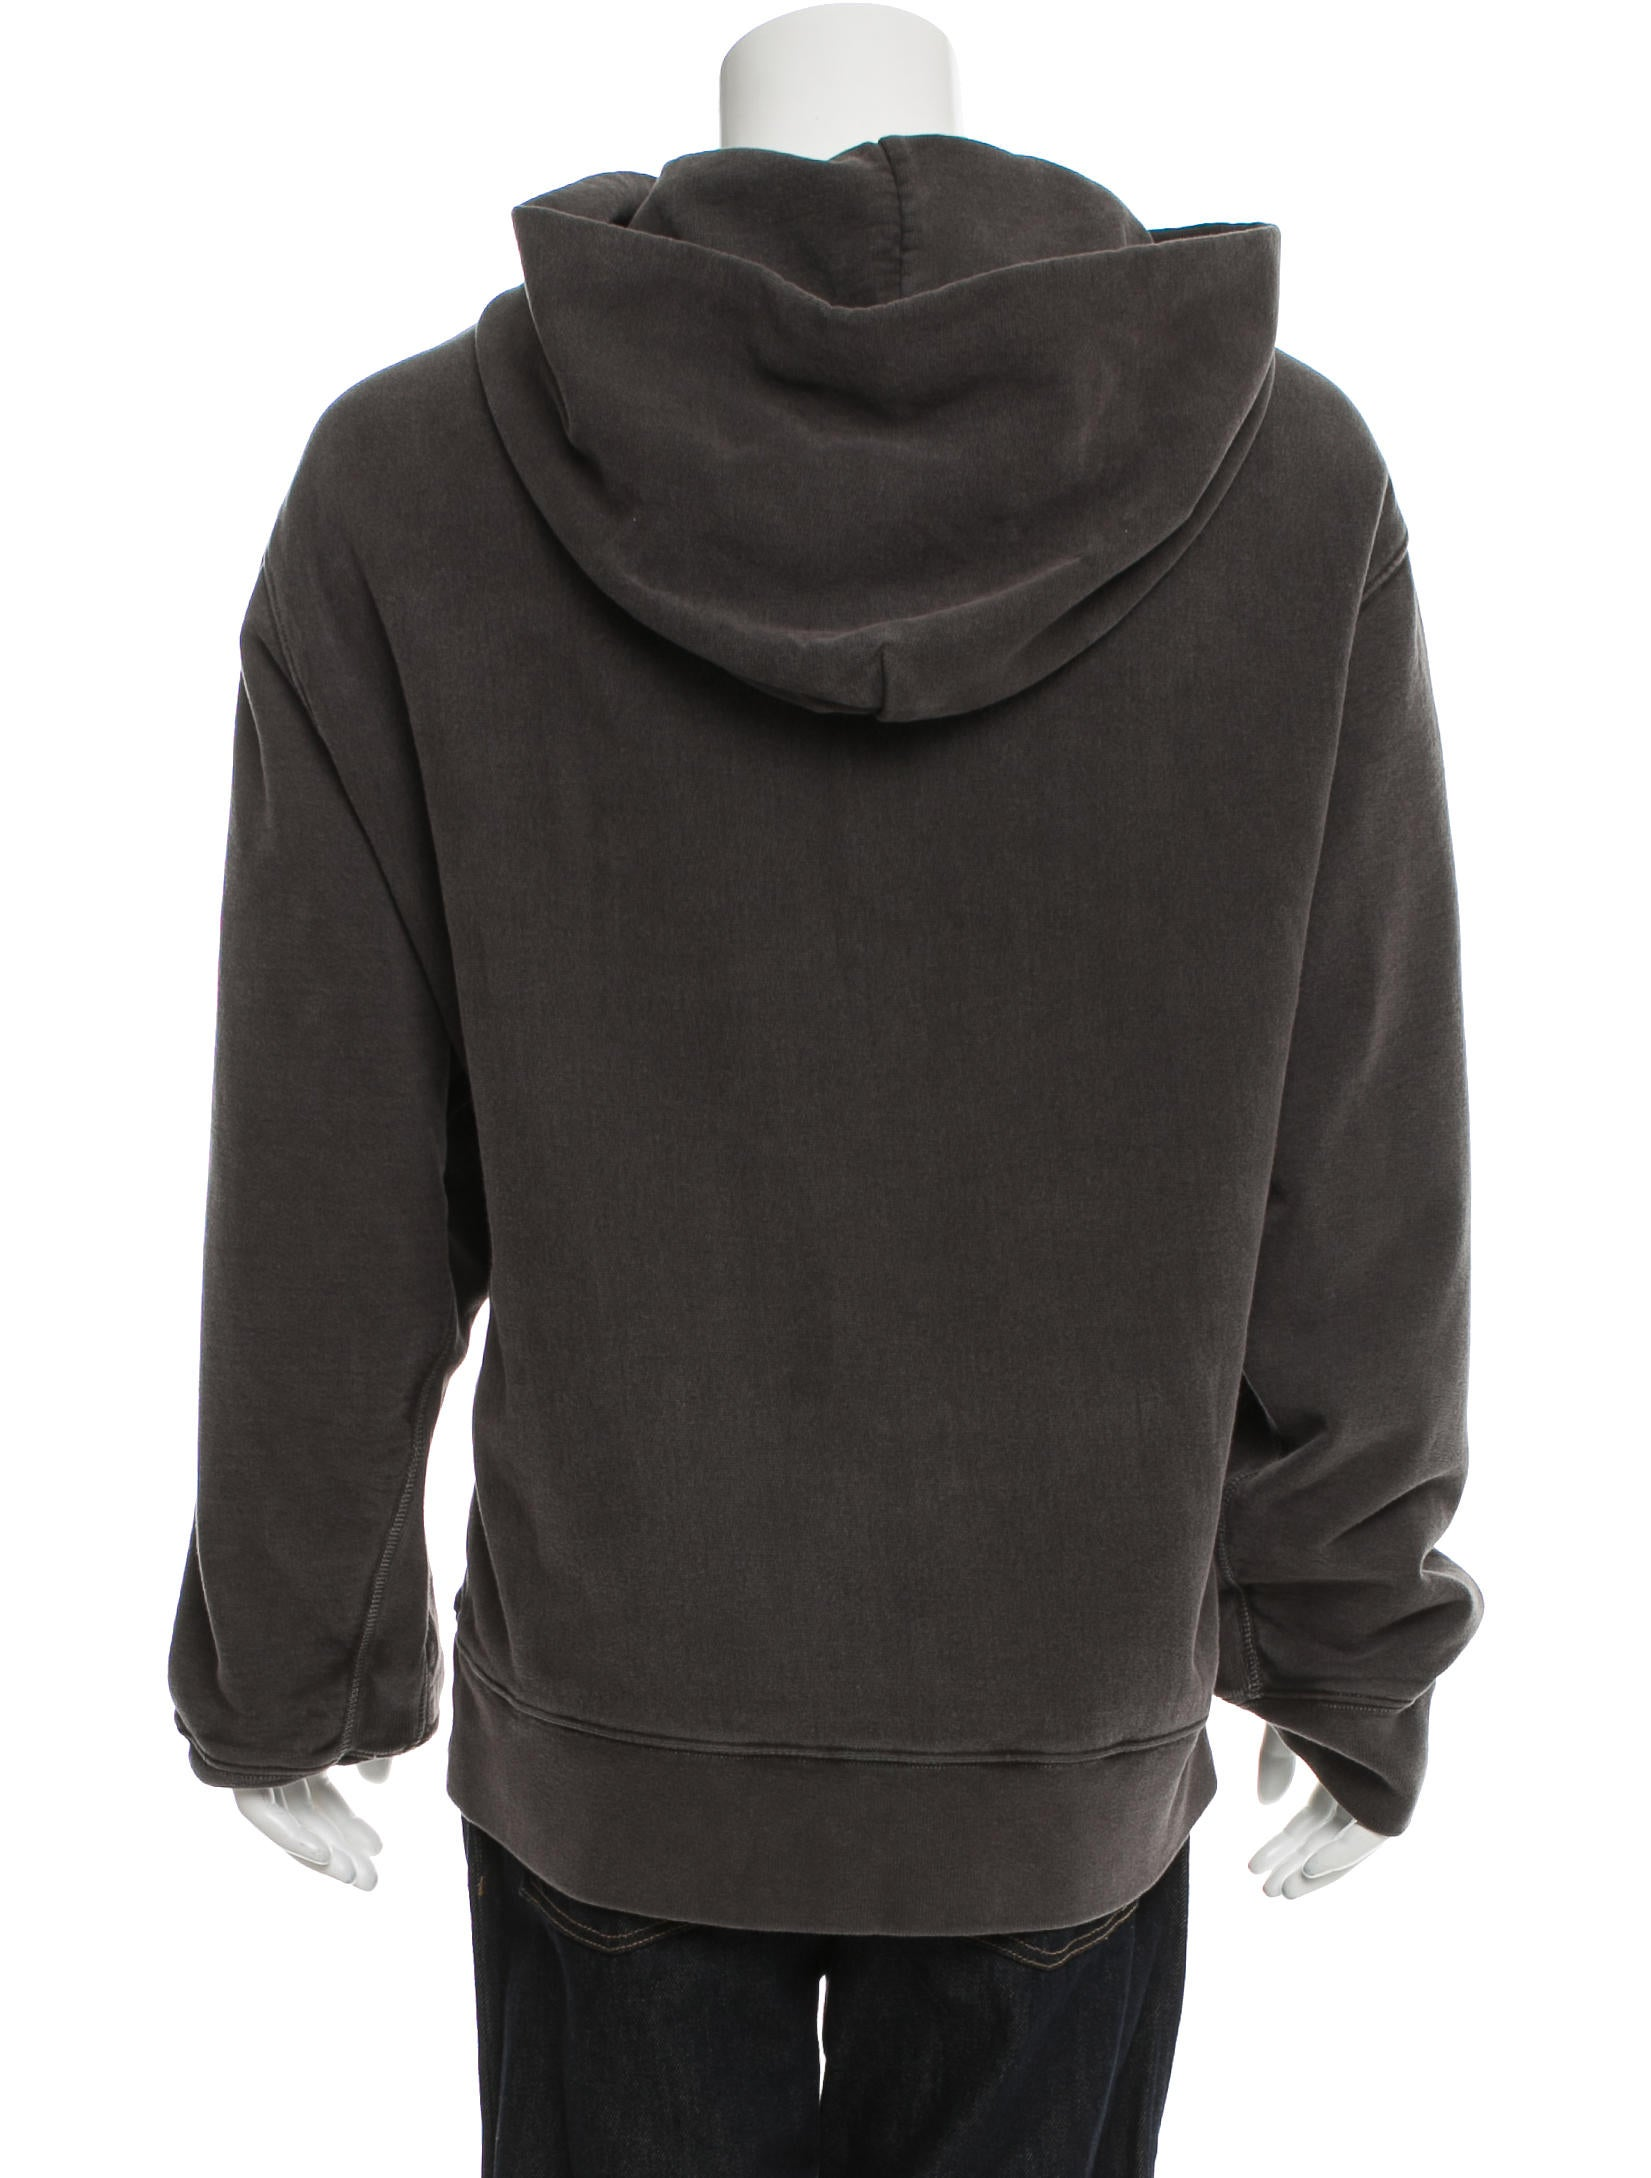 yeezy season 3 hoodie clothing wyeez20437 the realreal. Black Bedroom Furniture Sets. Home Design Ideas